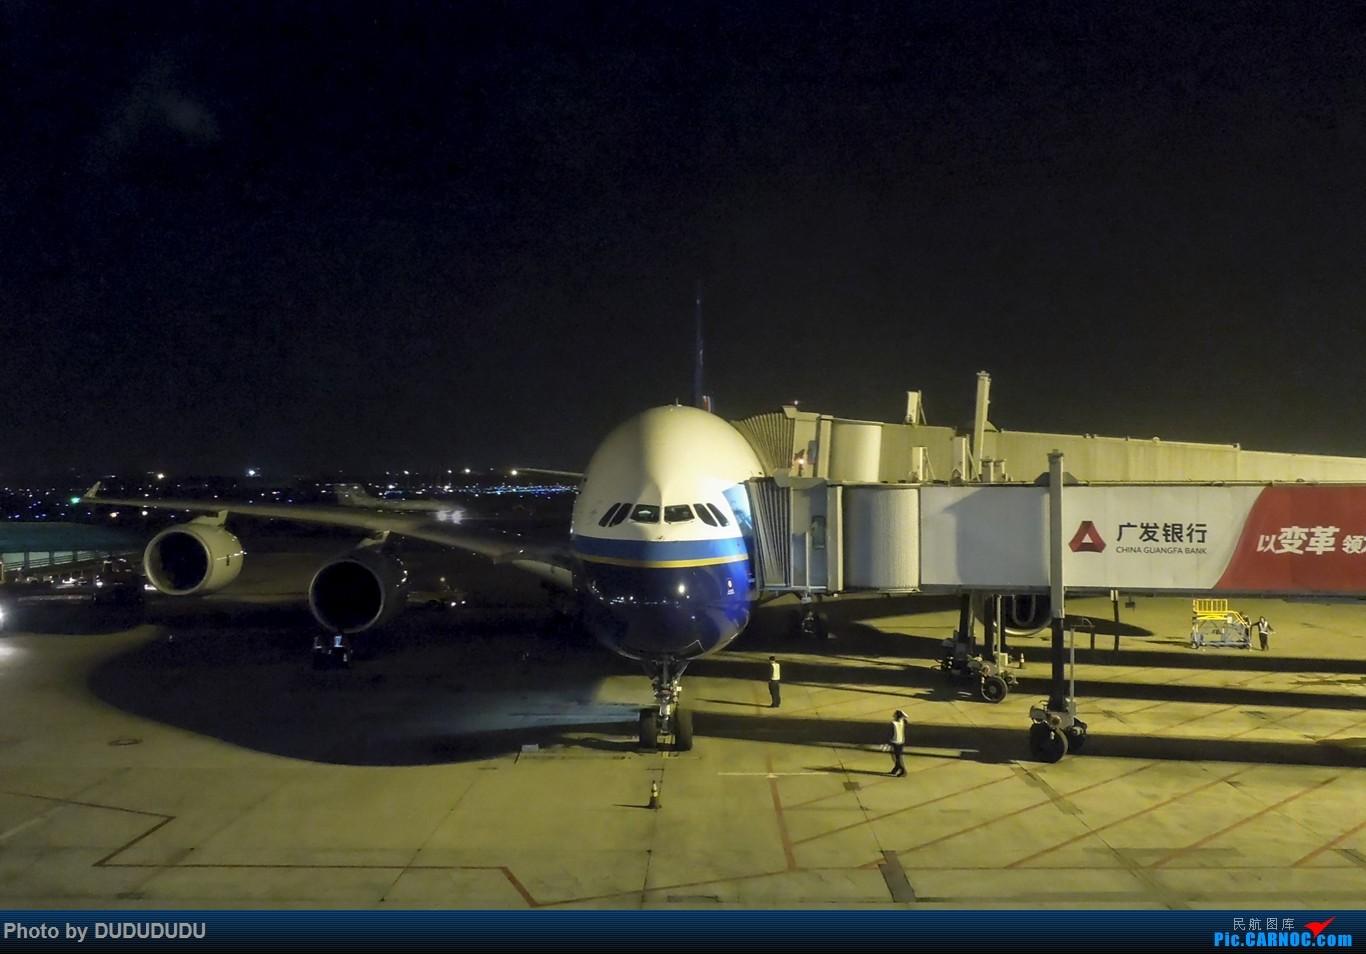 Re:[原创]【DUDUDUDU】暑期飞行合集 从A388到MA60 AIRBUS A380 B-6140 中国北京首都国际机场